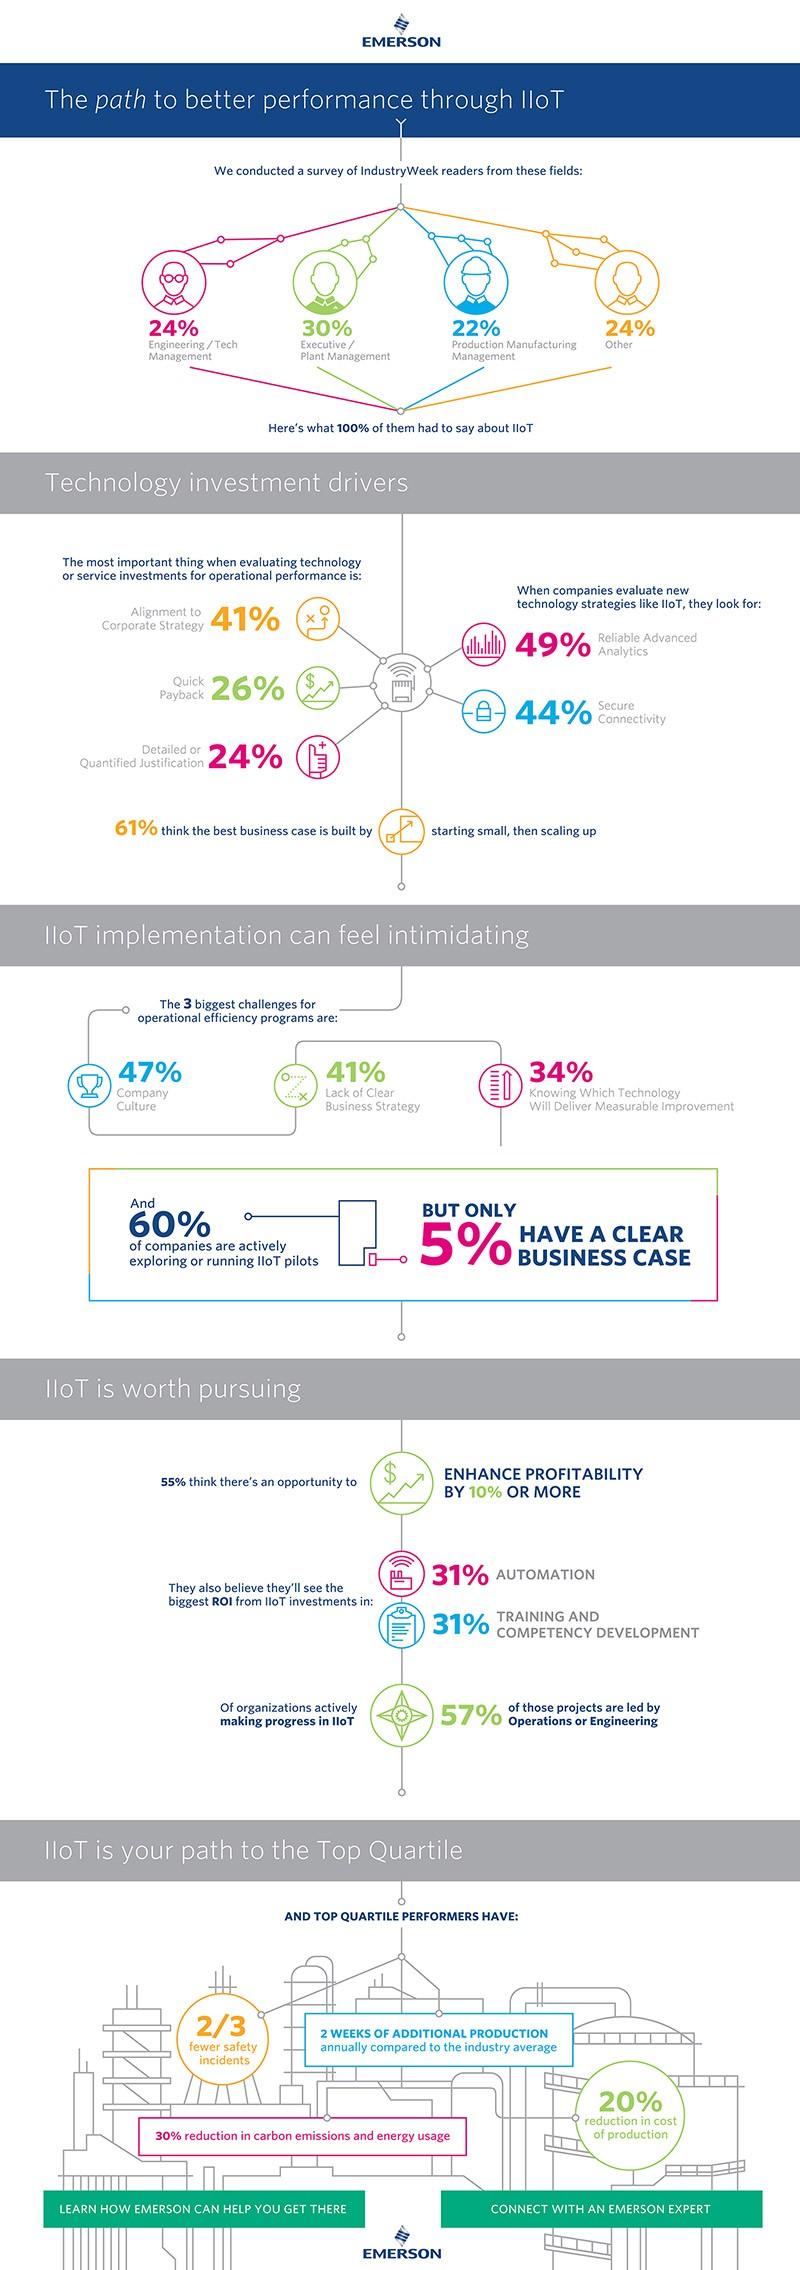 Emerson IIoT infographic